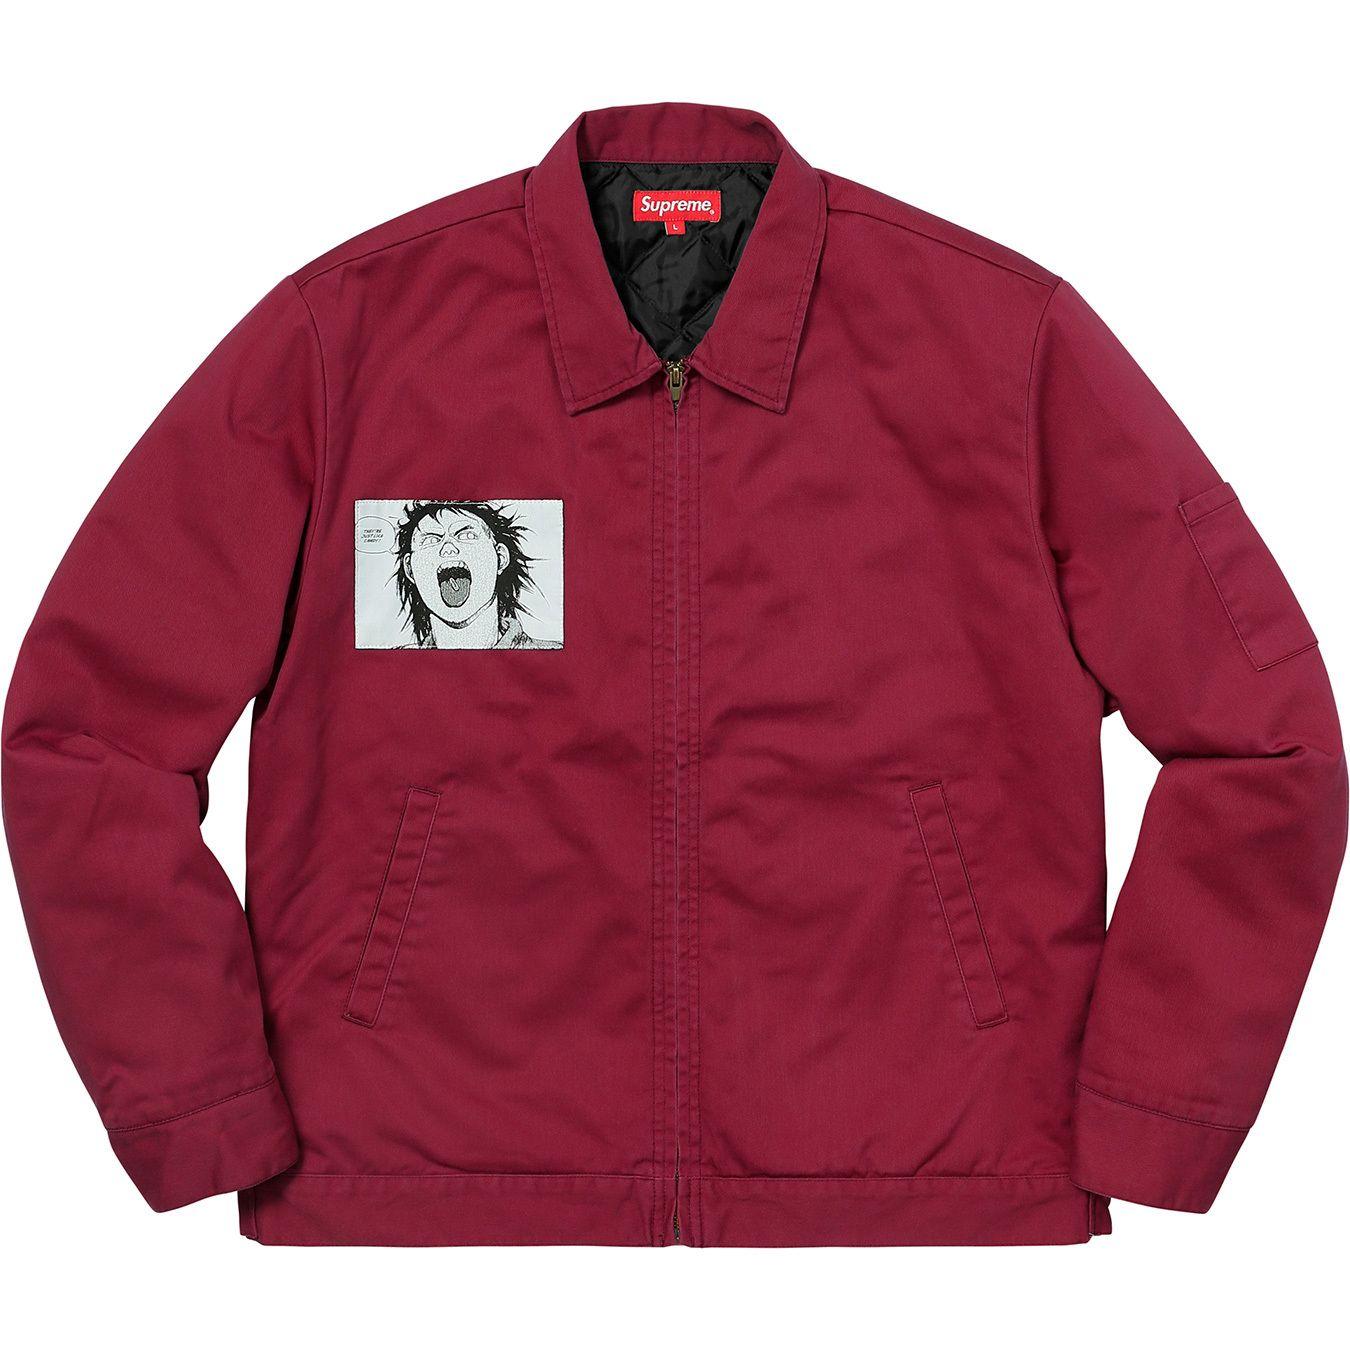 Supreme Akira Work Jacket Light Burgundy Supreme Cloth Work Jackets Jackets Clothes [ 1350 x 1350 Pixel ]